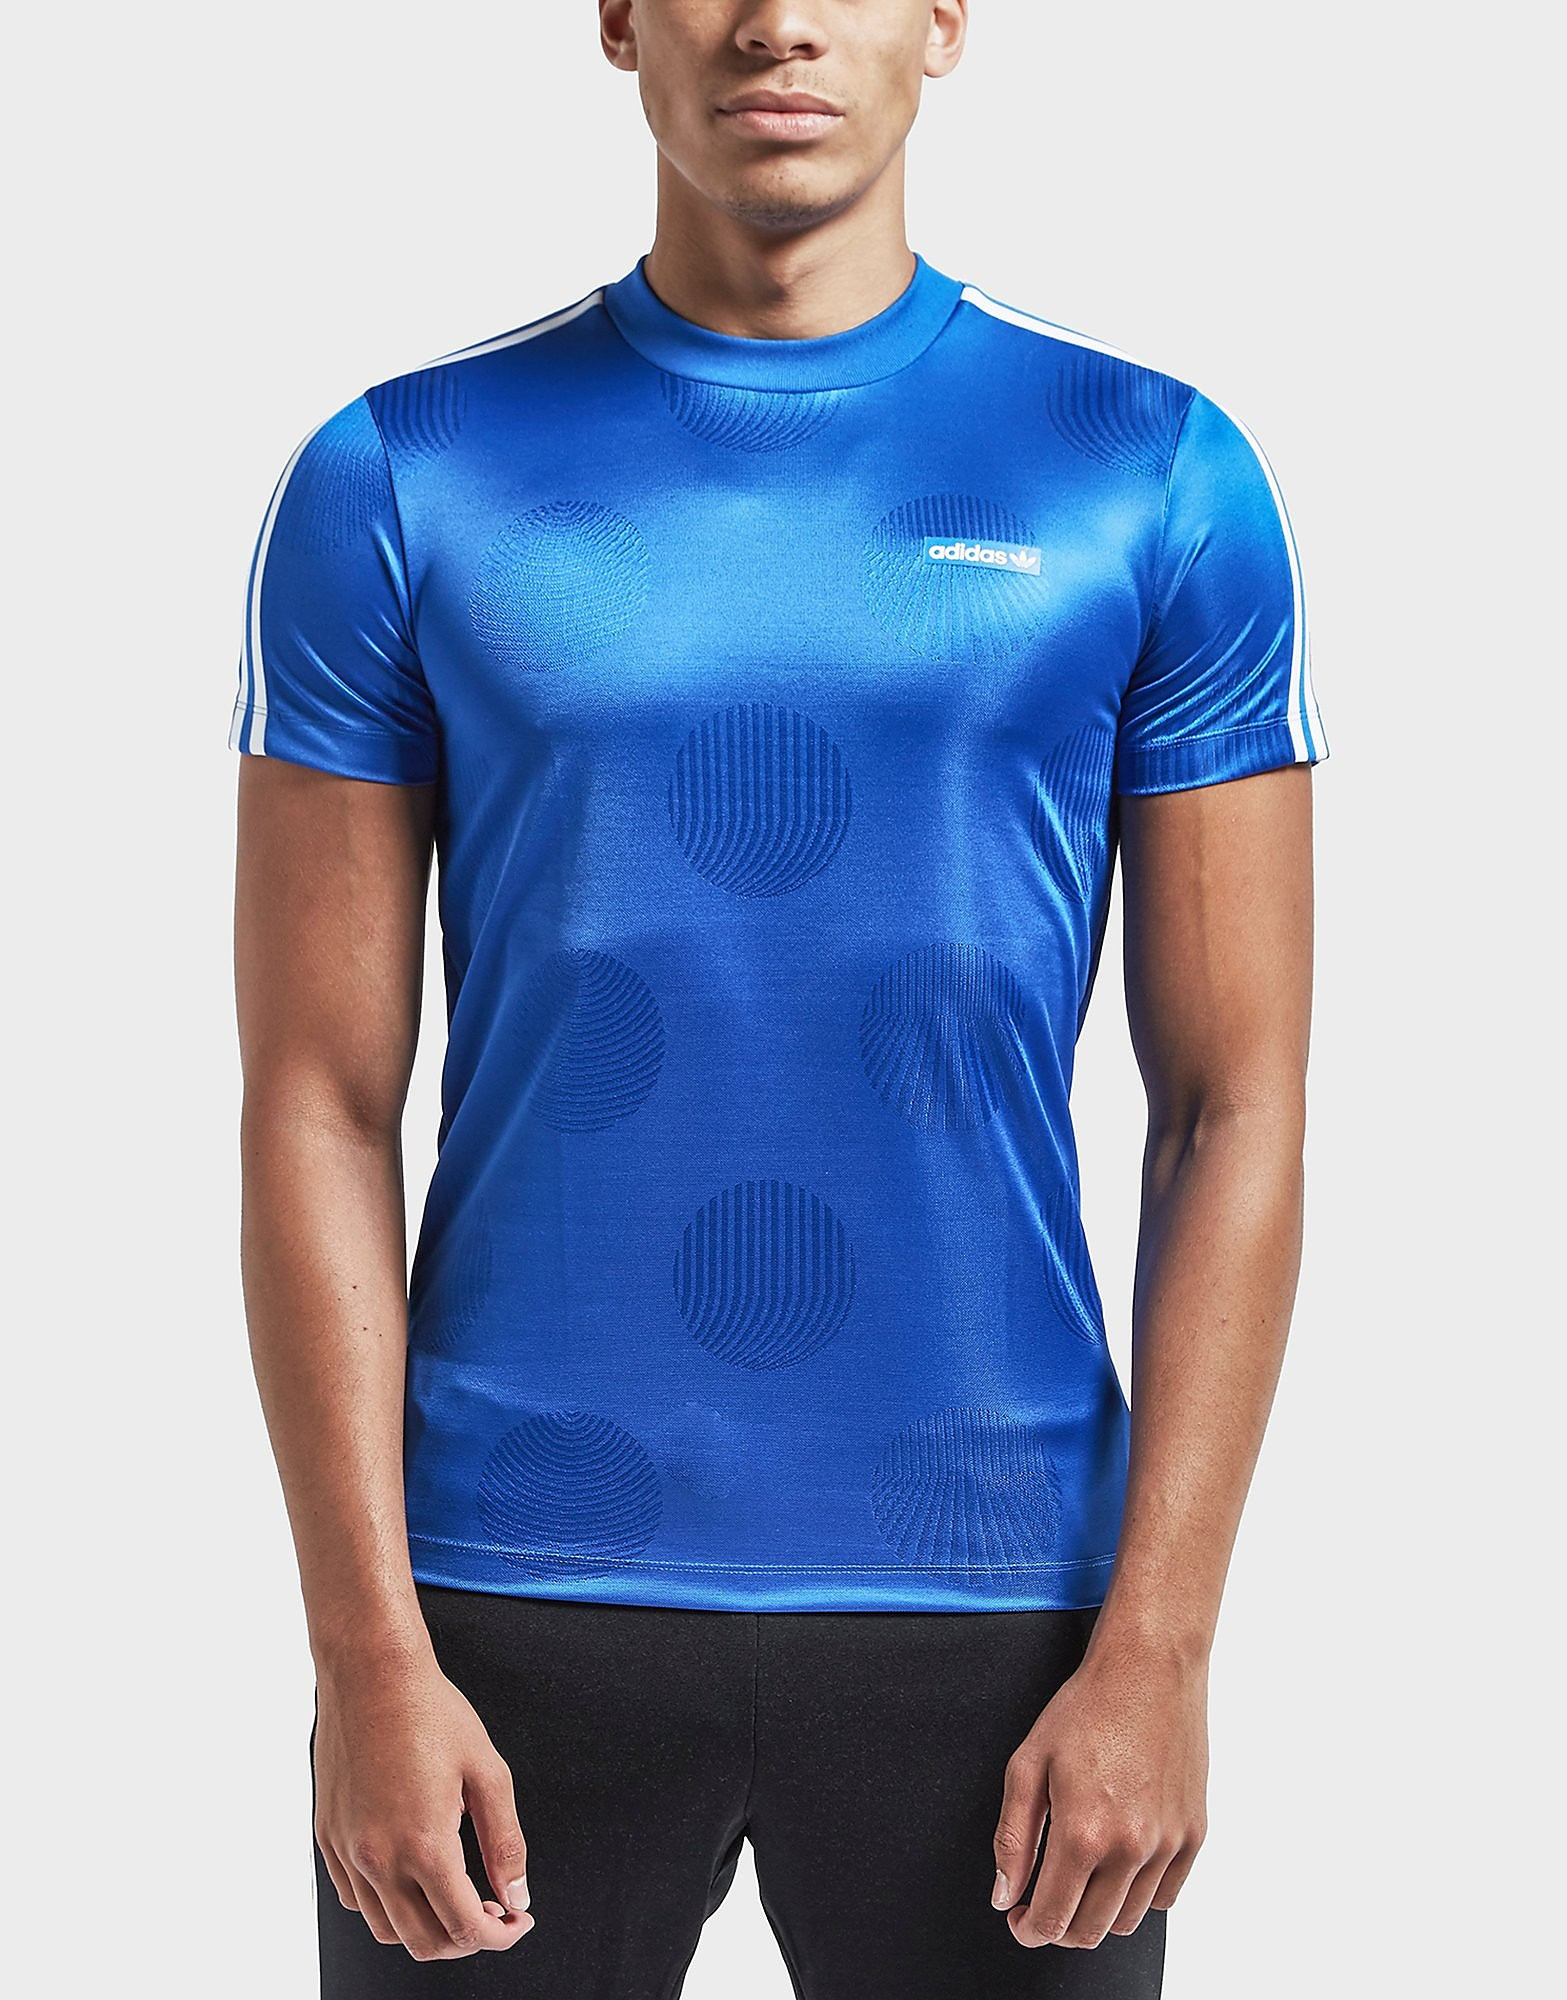 adidas Originals Tennoji Short Sleeve T-Shirt